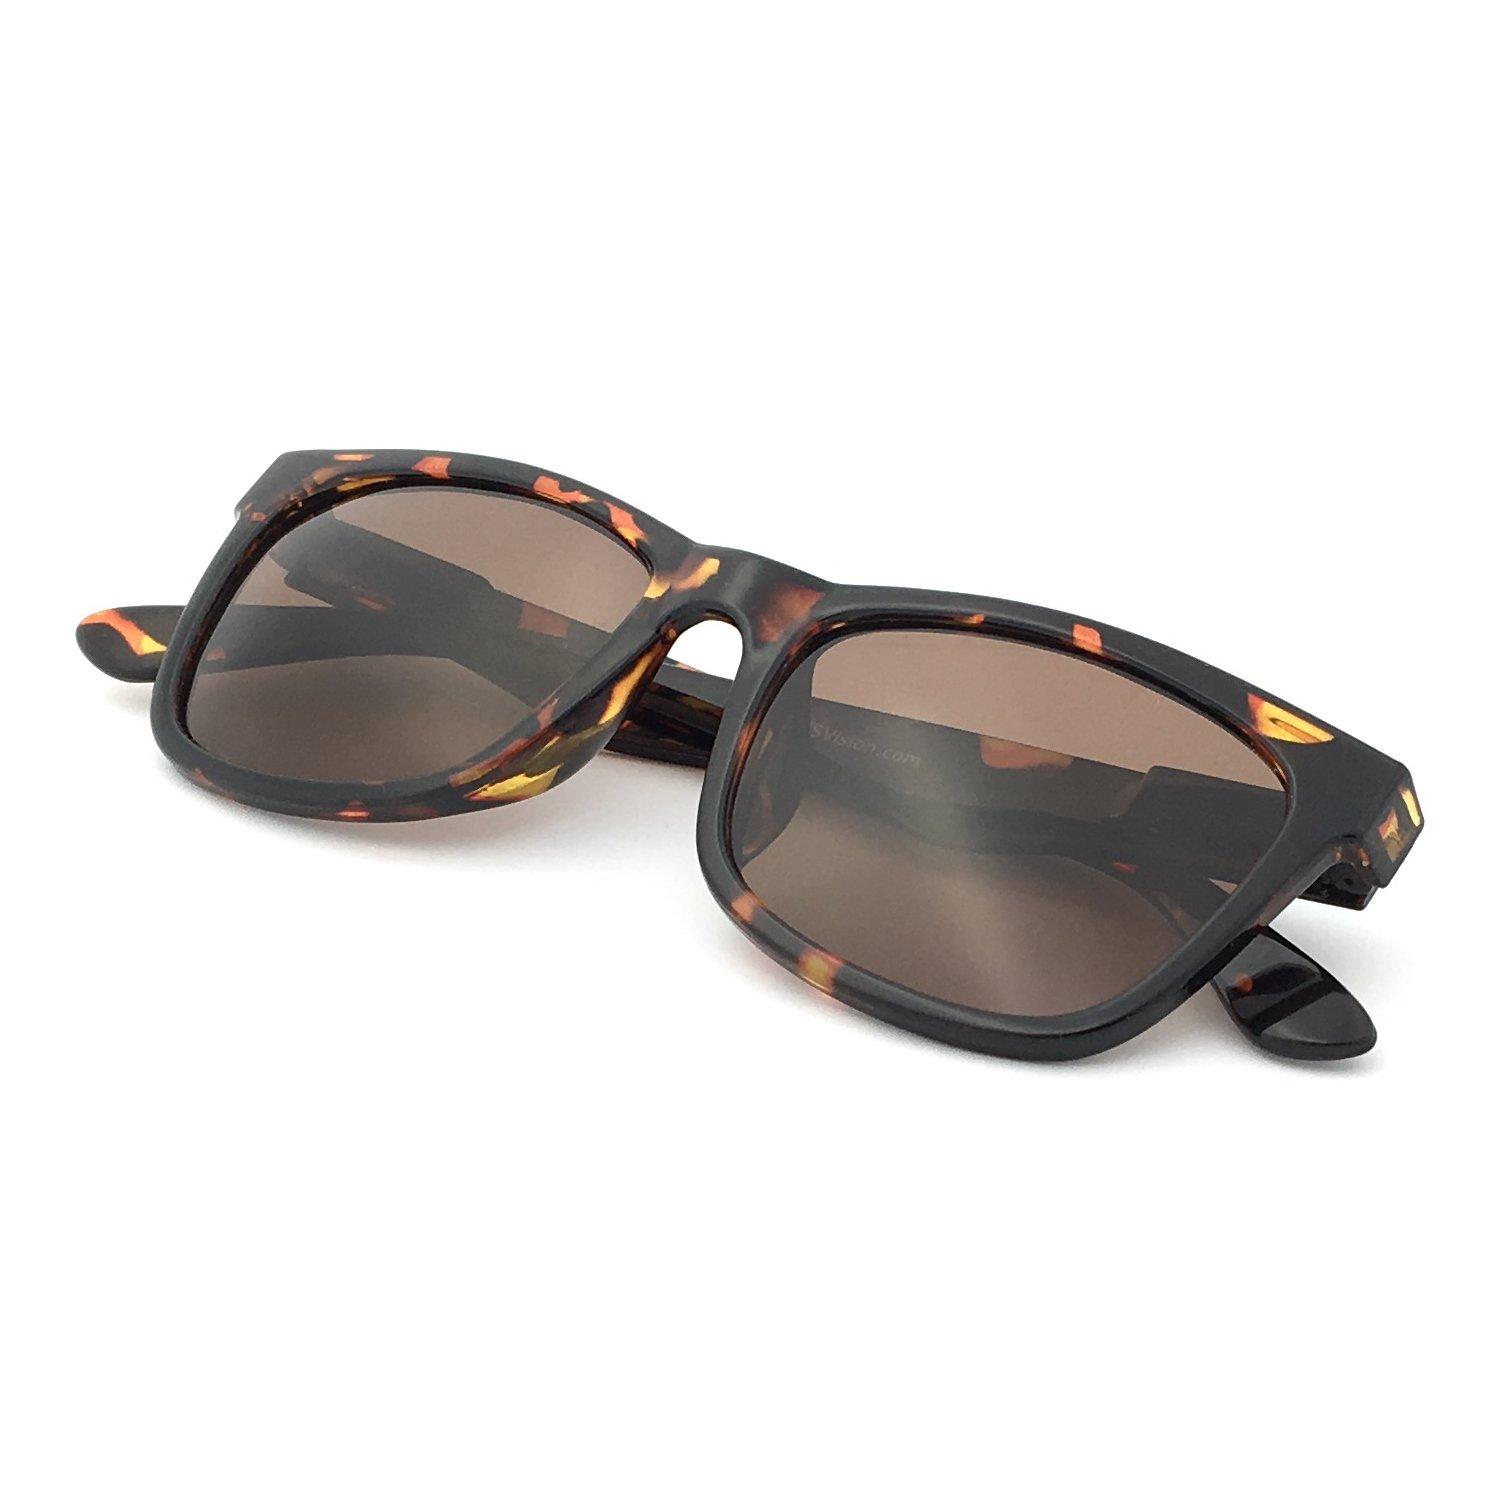 J+S Classic 80's Wayfarer Mark II Sunglasses, Polarized, 100% UV protection, Spring Hinged (Tortoise Frame/Brown Lens) by J+S